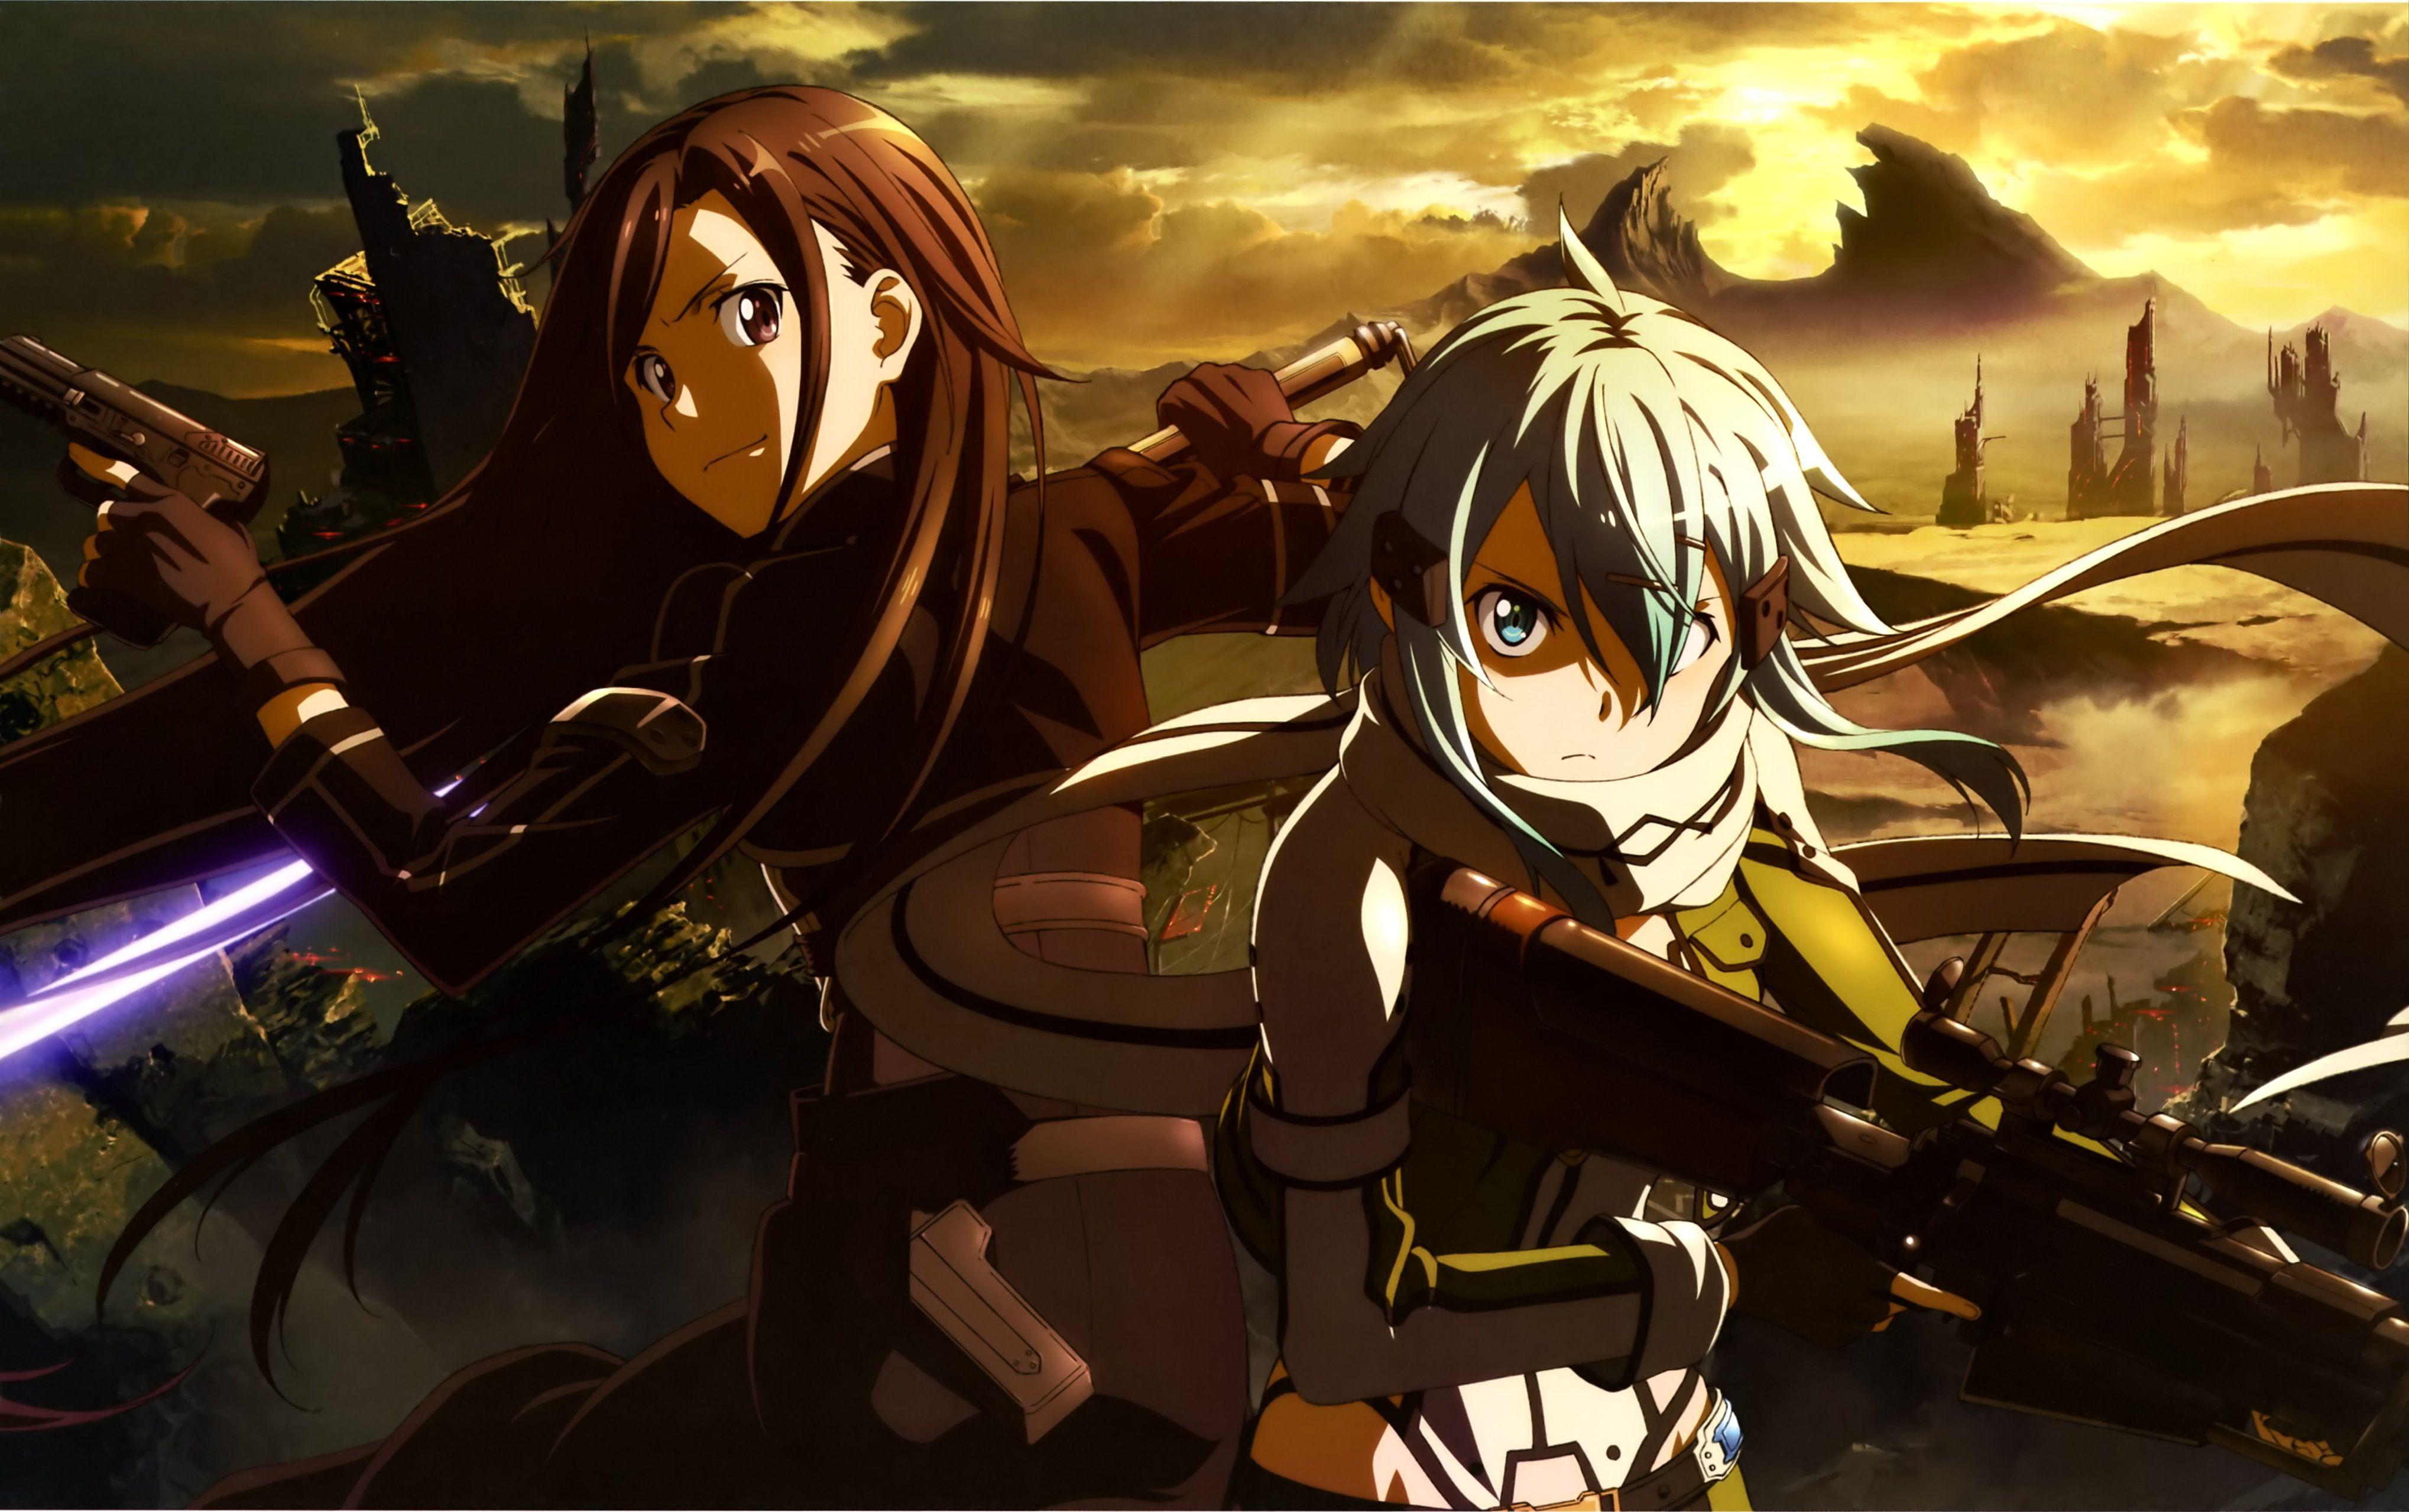 Anime Sword Art line II Kirito SAO Sinon SAO Wallpaper